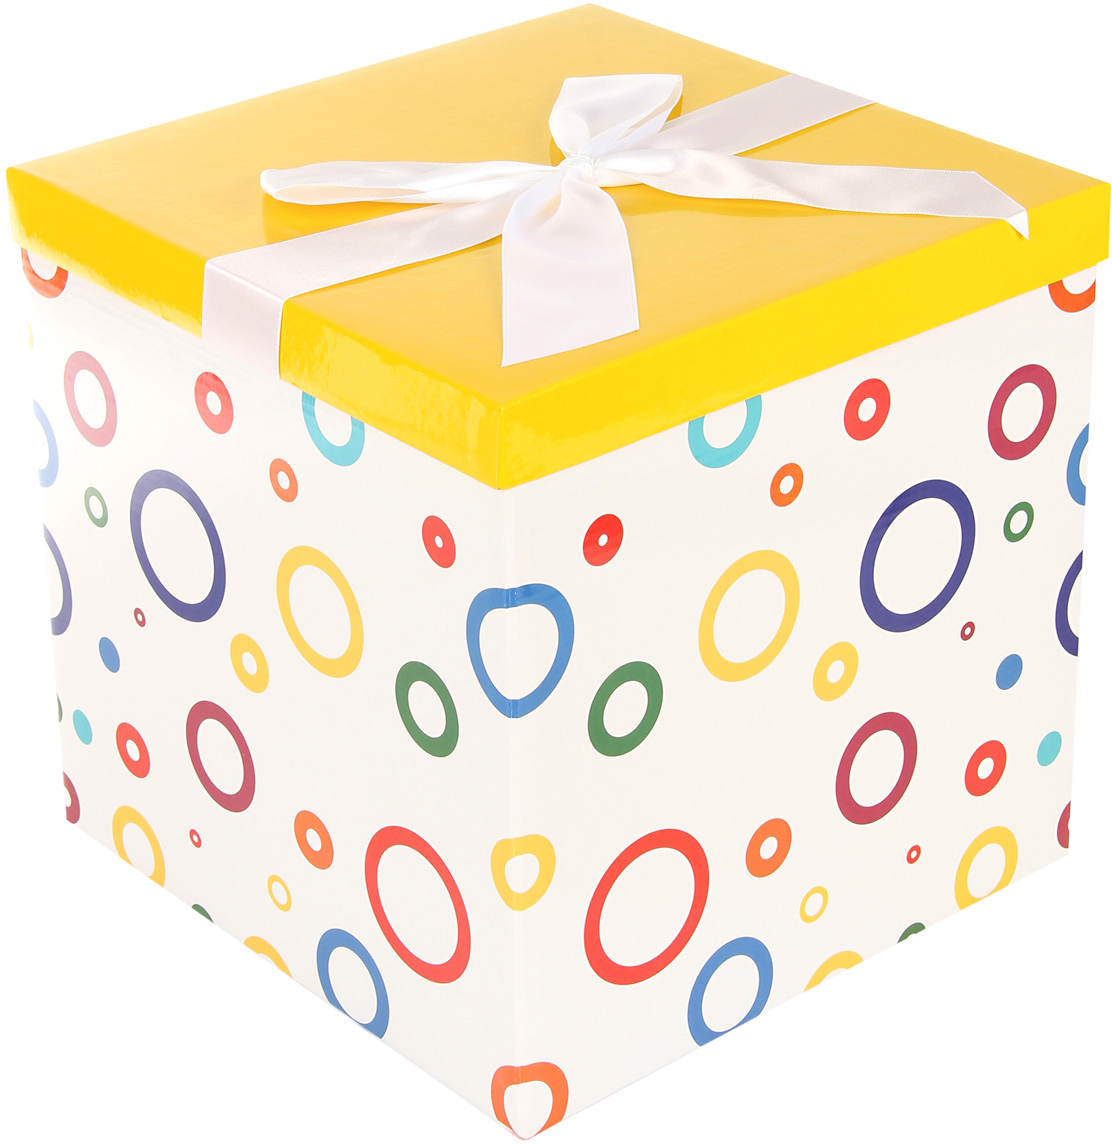 Коробка подарочная Veld-Co Giftbox. Трансформер. Цветные колечки, цвет: белый, 25,5 х 25,5 х 25 см коробка подарочная veld co giftbox трансформер цветные колечки цвет белый 25 5 х 25 5 х 25 см